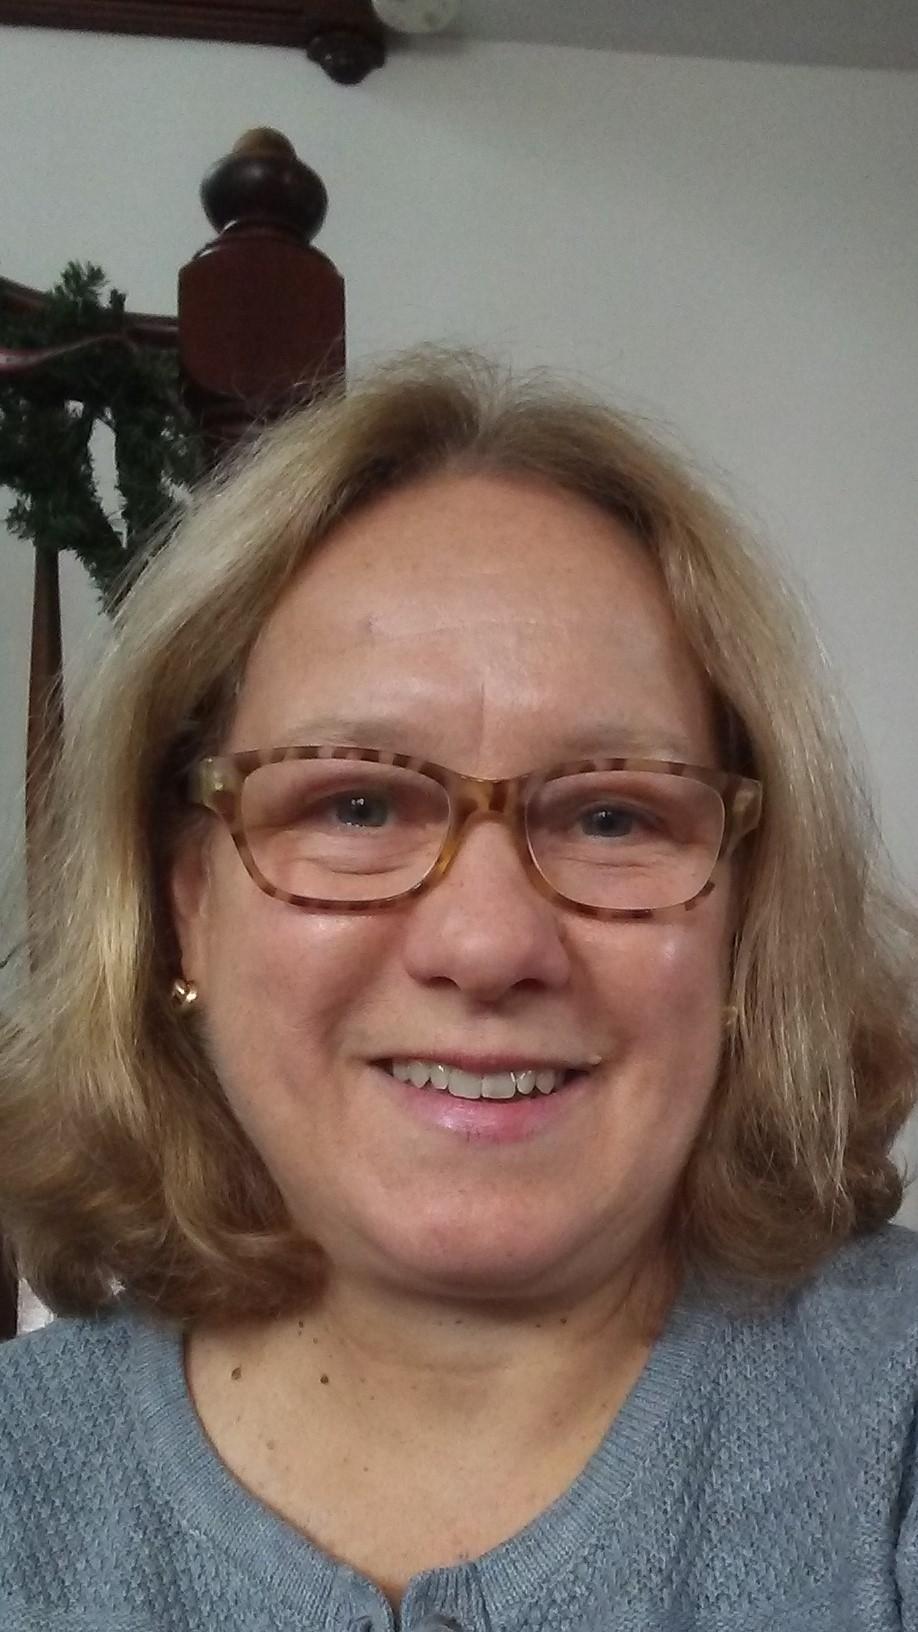 Sarah Starkweather, Clerk